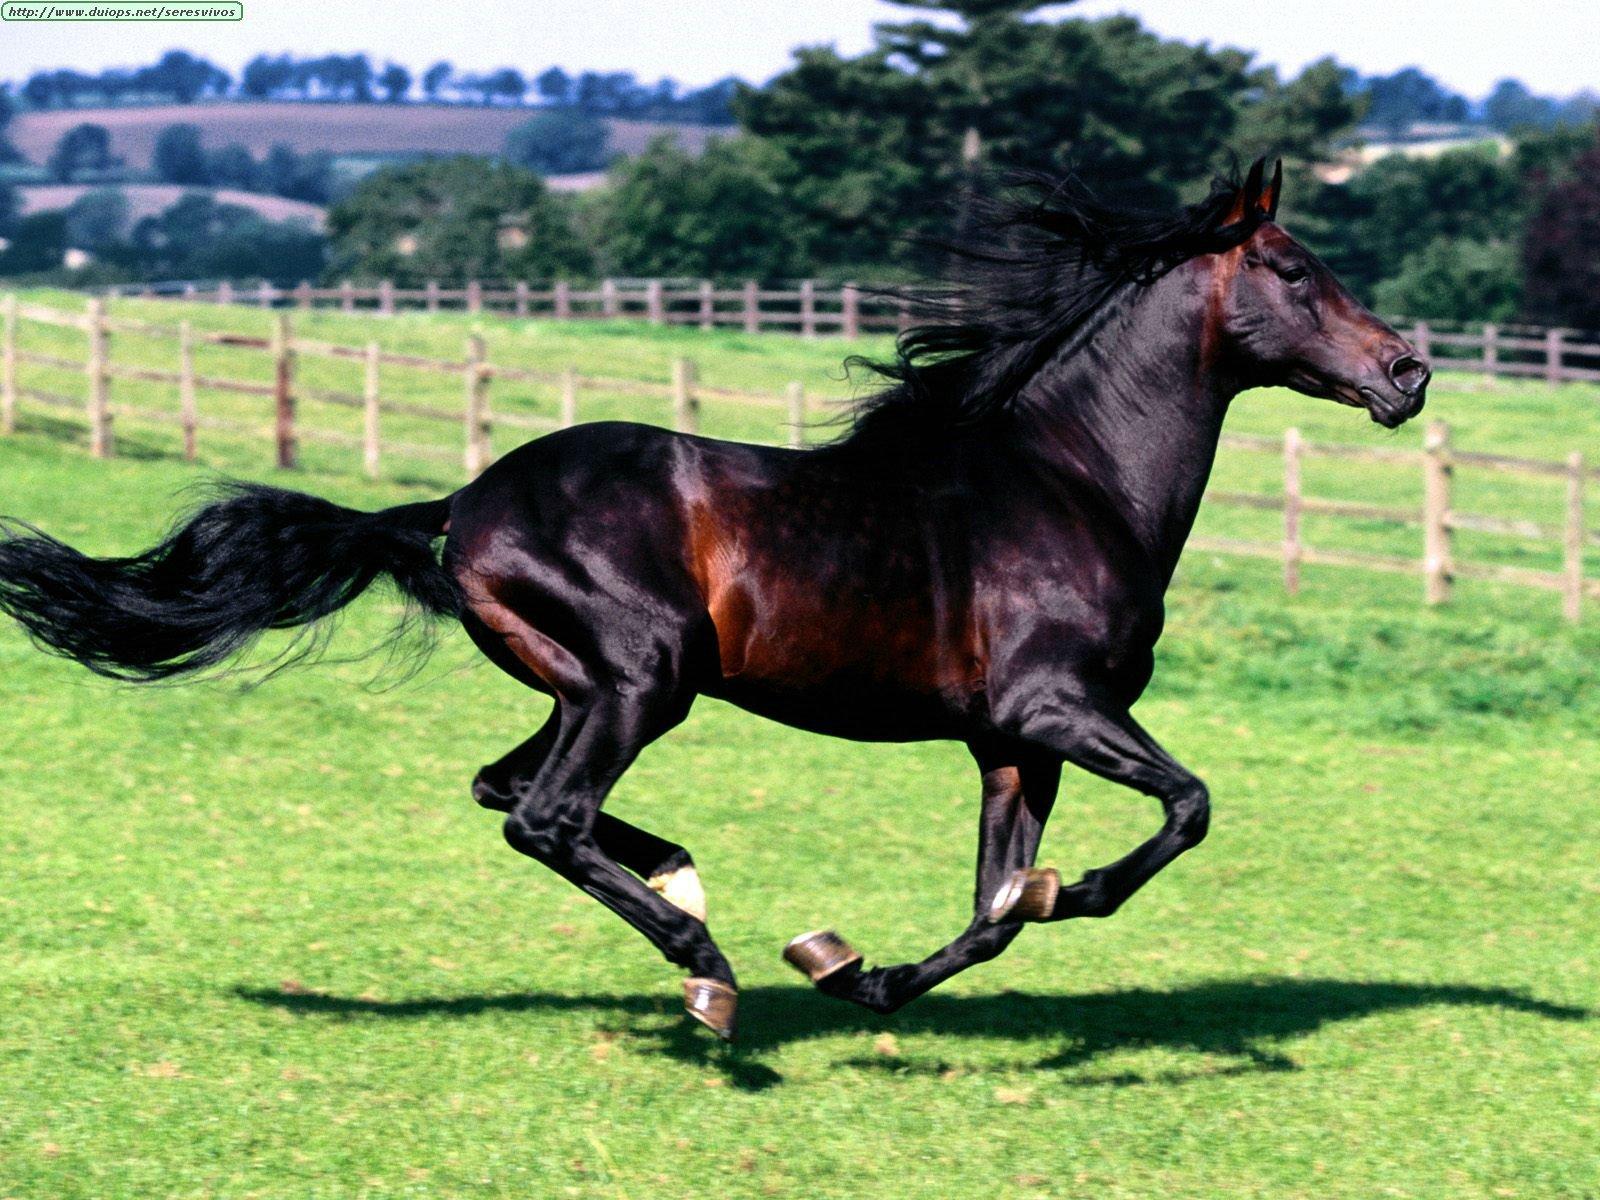 http://www.duiops.net/seresvivos/galeria/caballos/Animals%20Horses_Full%20Stride,%20Spanish%20Horse.jpg